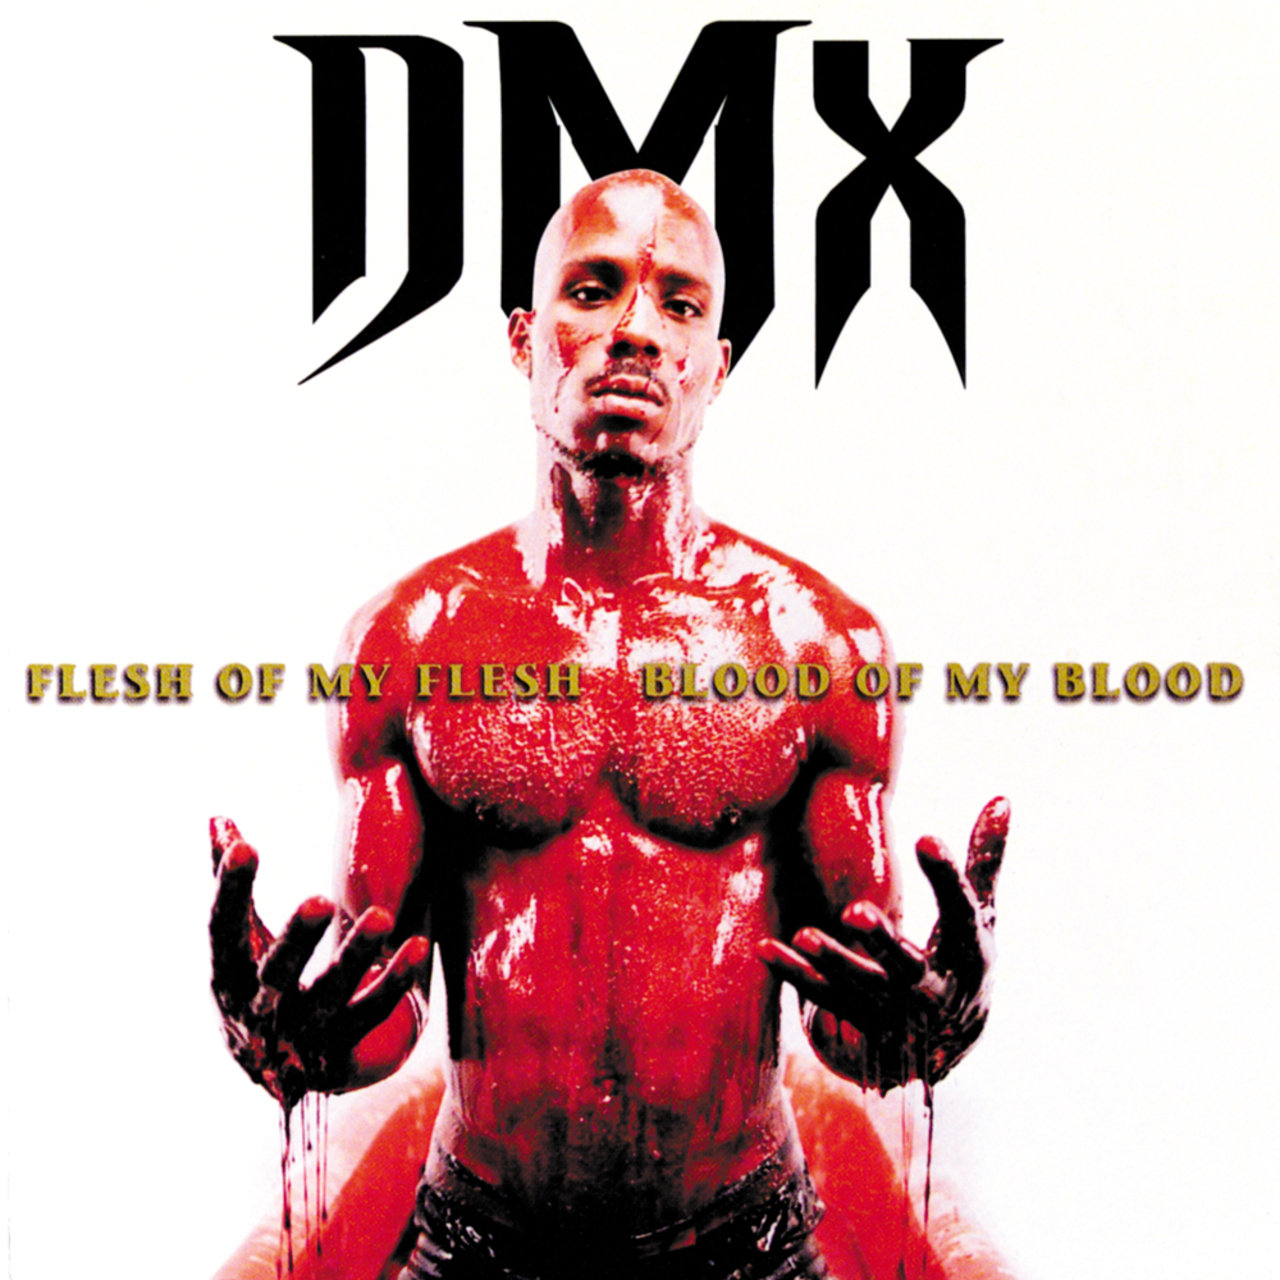 flesh-of-my-flesh-blood-of-my-blood-album-review